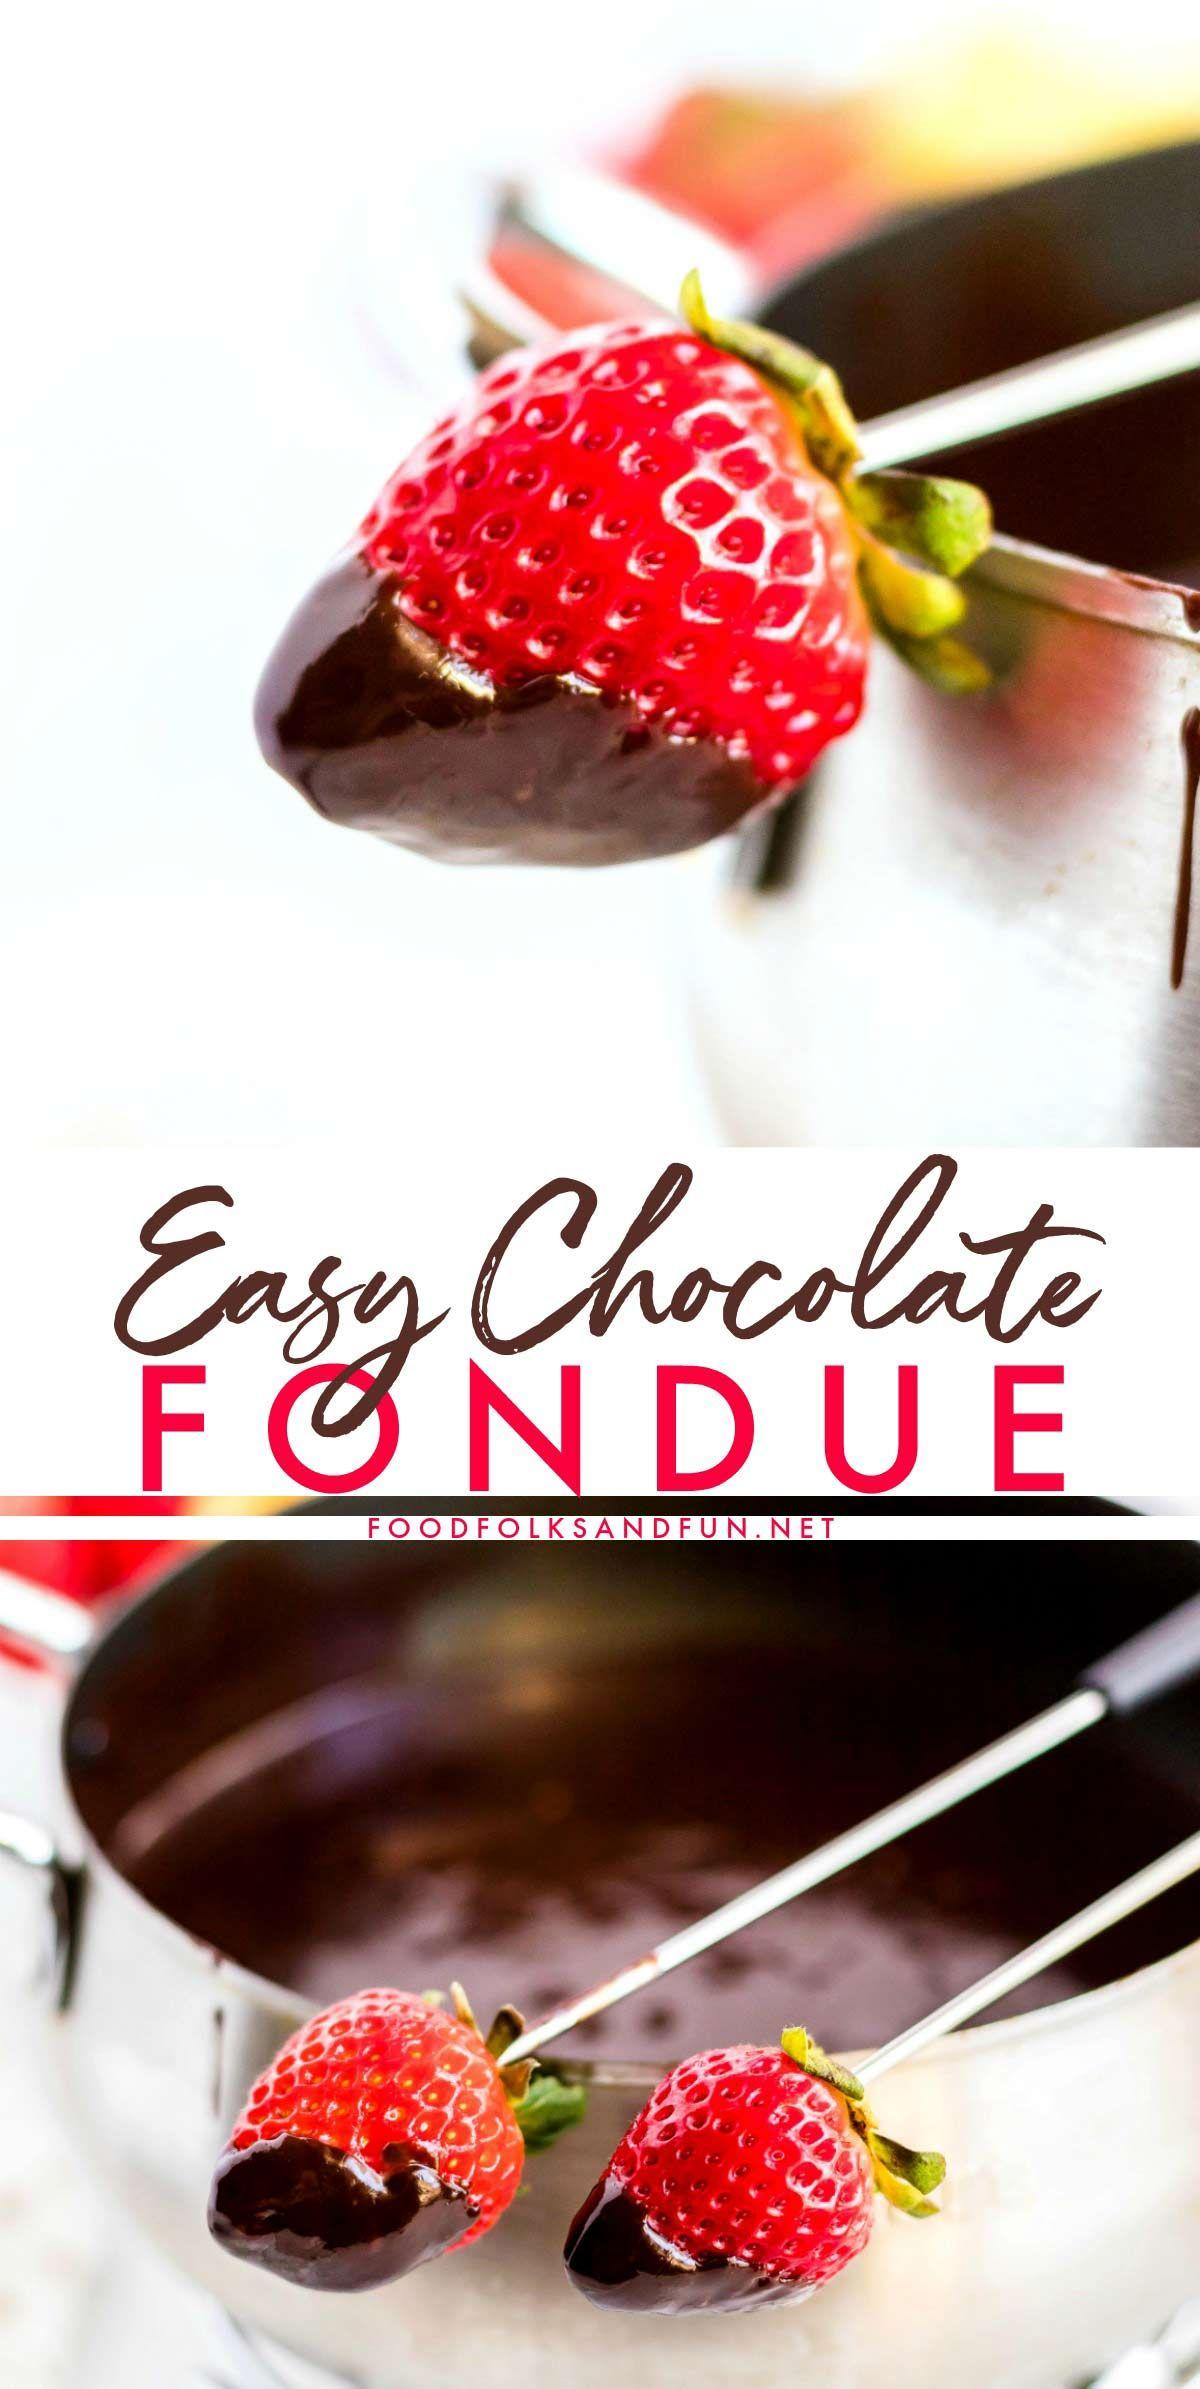 Easy Chocolate Fondue #chocolatefonduerecipes